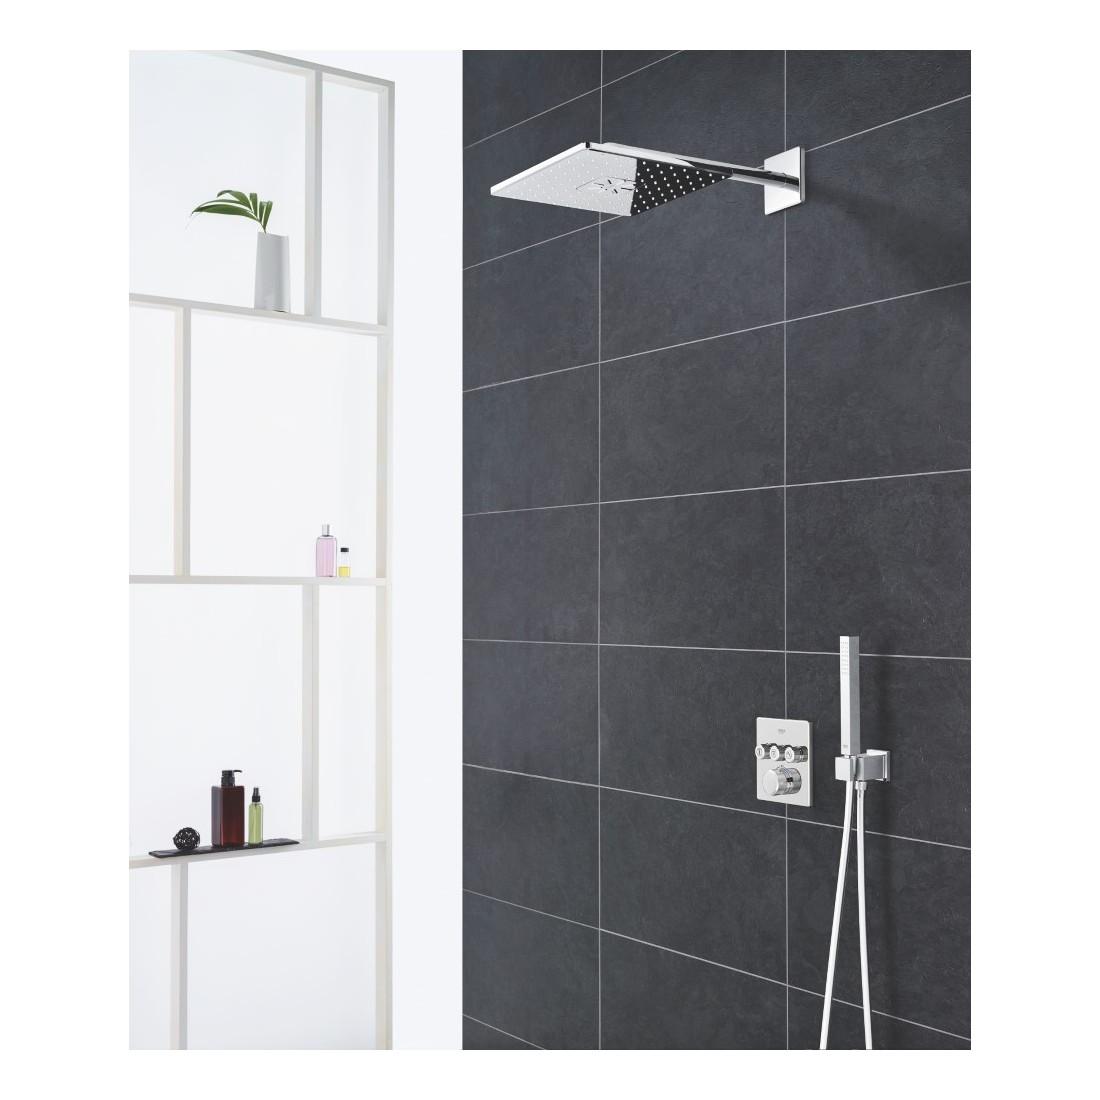 Potinkinis dušo komplektas Grohe, Grohtherm SmartControl Perfect SmartActive Cube 310